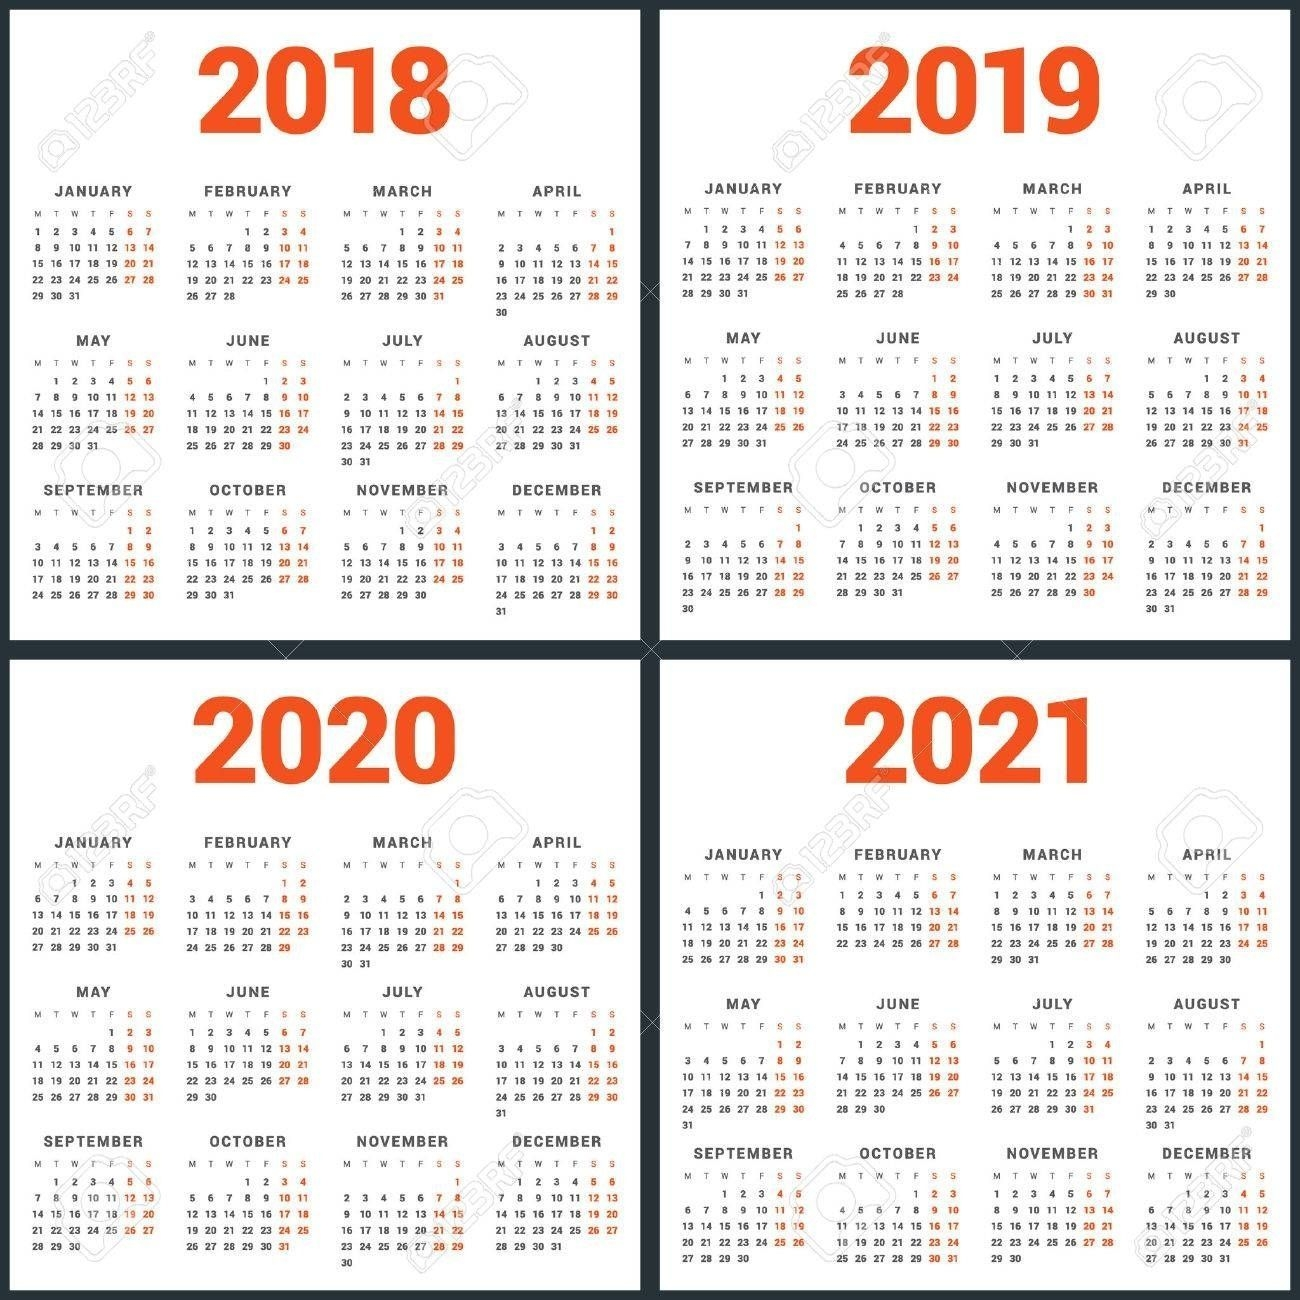 2020 8 X 10 Calendars In 2020 | National Holiday Calendar